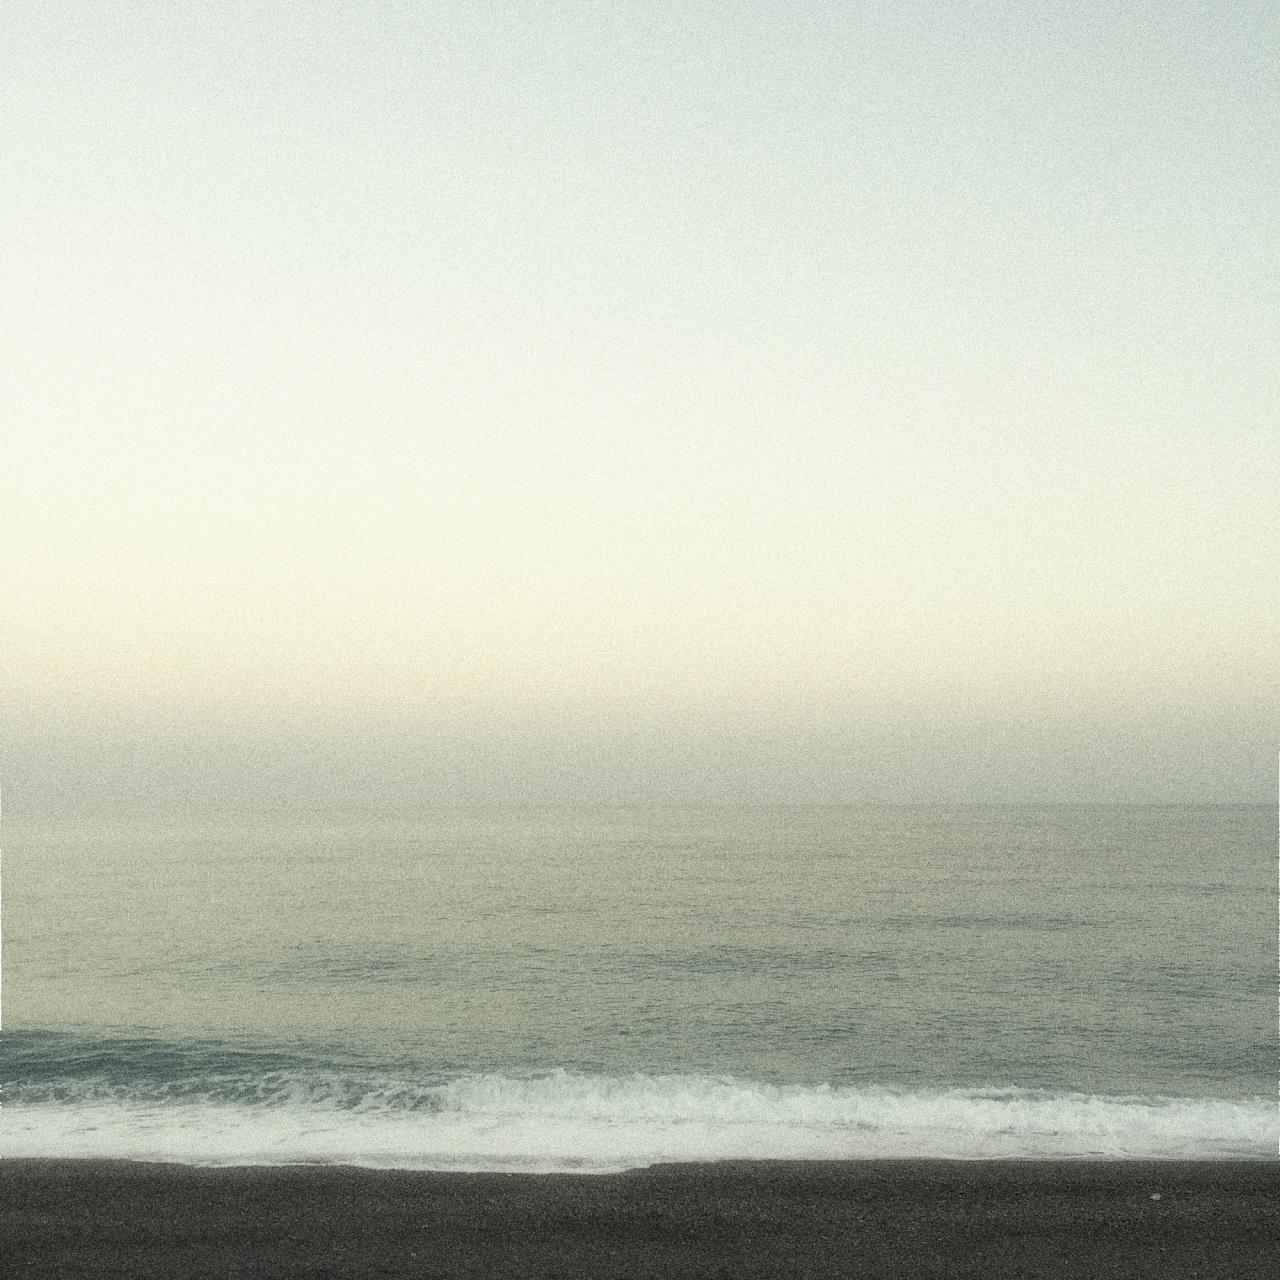 SERGIO GIANNOTTA - IL MARE DENTRO - STAMPA GICLEE' FINE ART SU CARTA HAHNEMÜHLE PHOTORAG CM 40 X CM 40